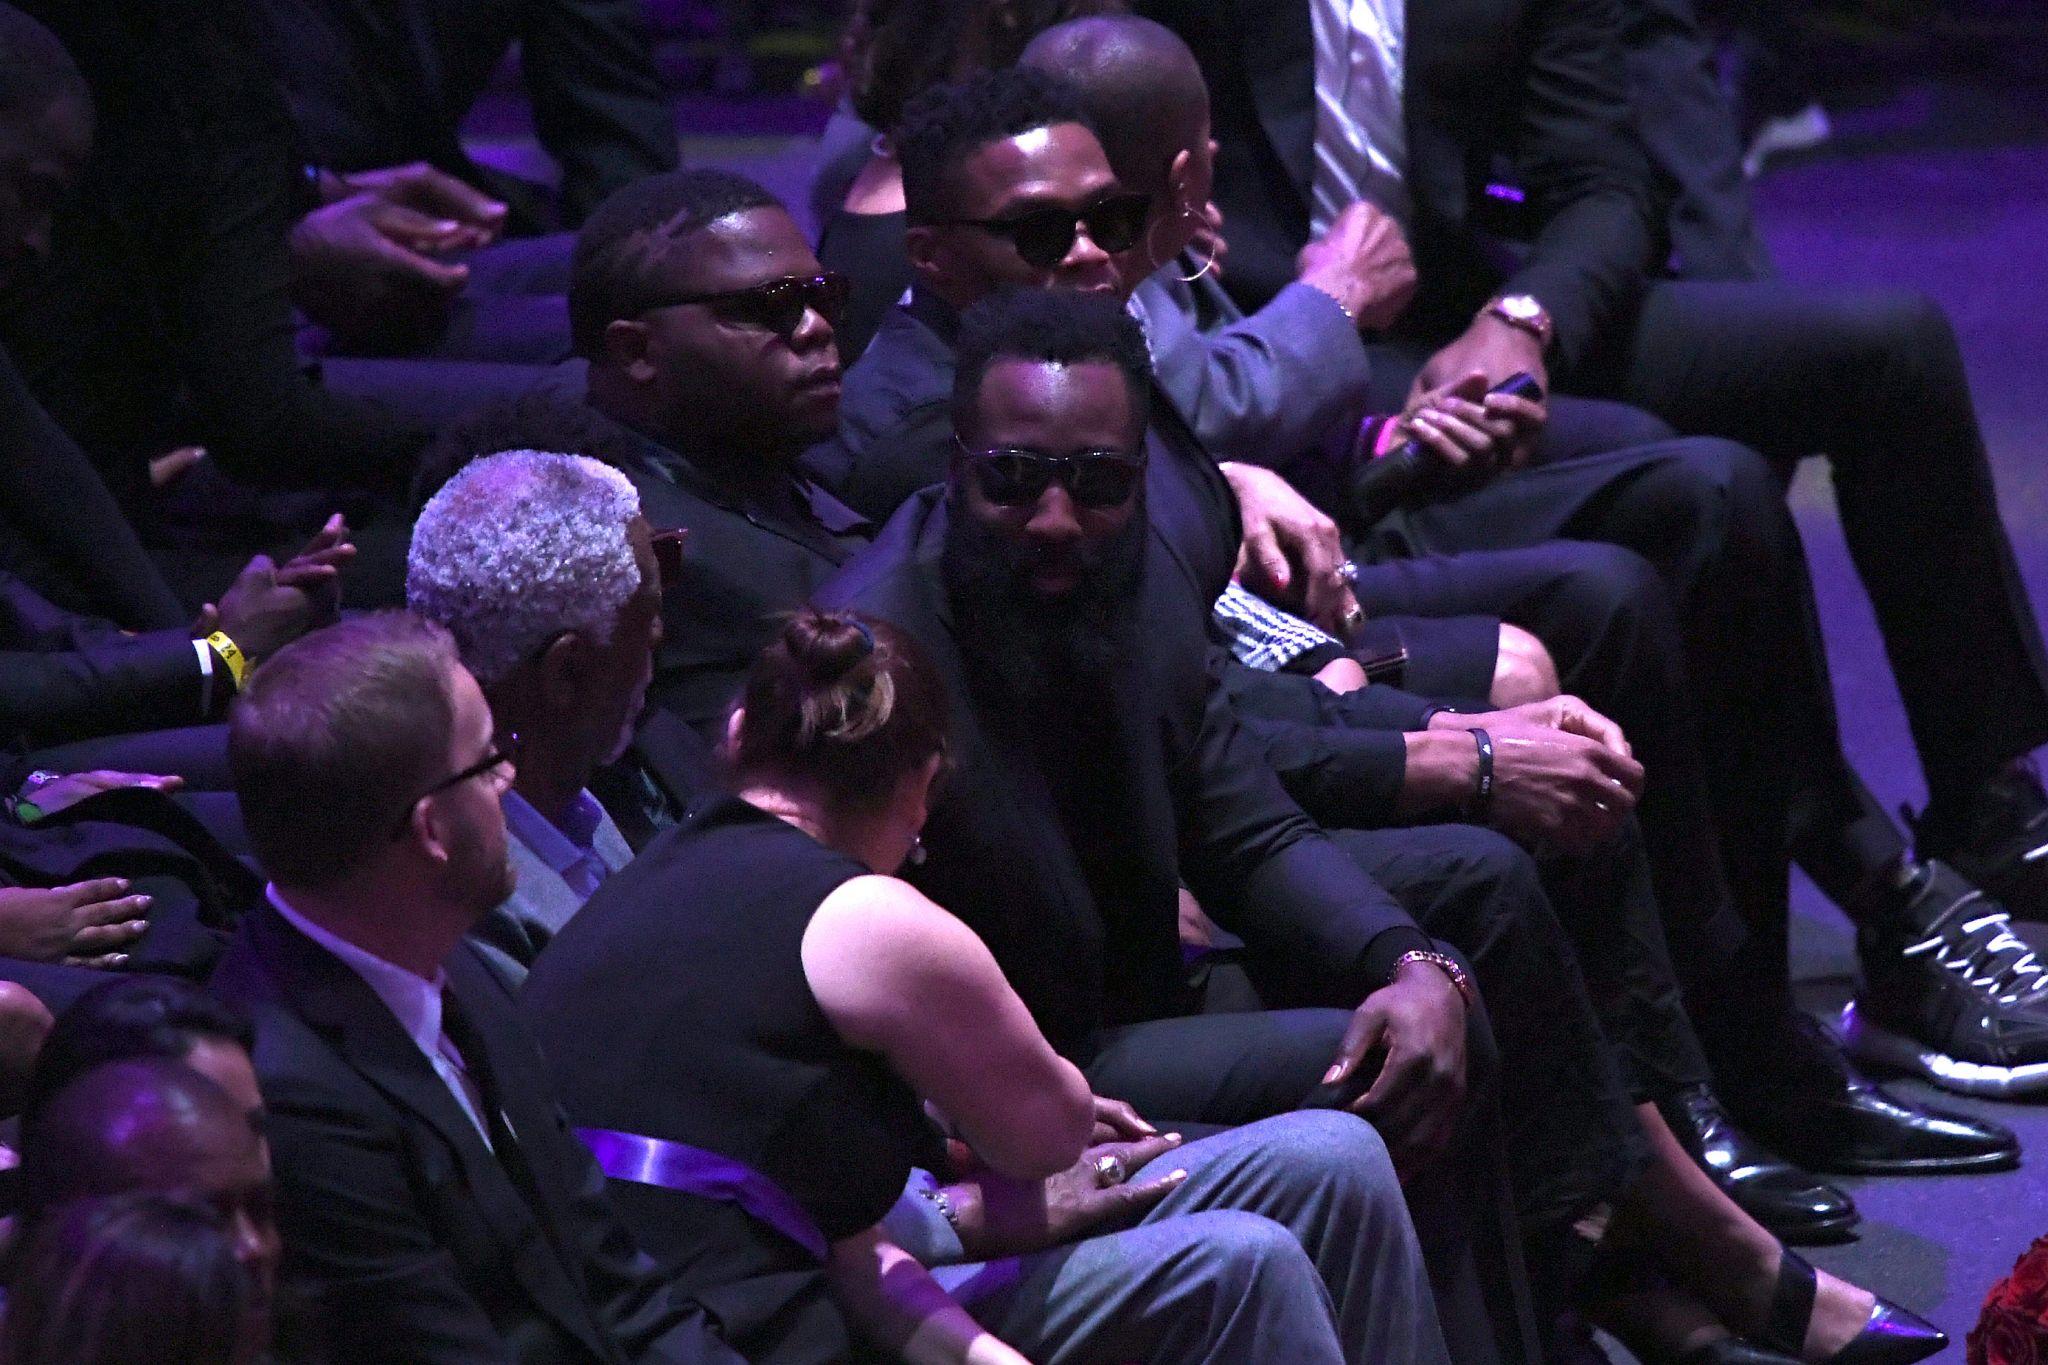 Rockets stars attend Kobe Bryant memorial